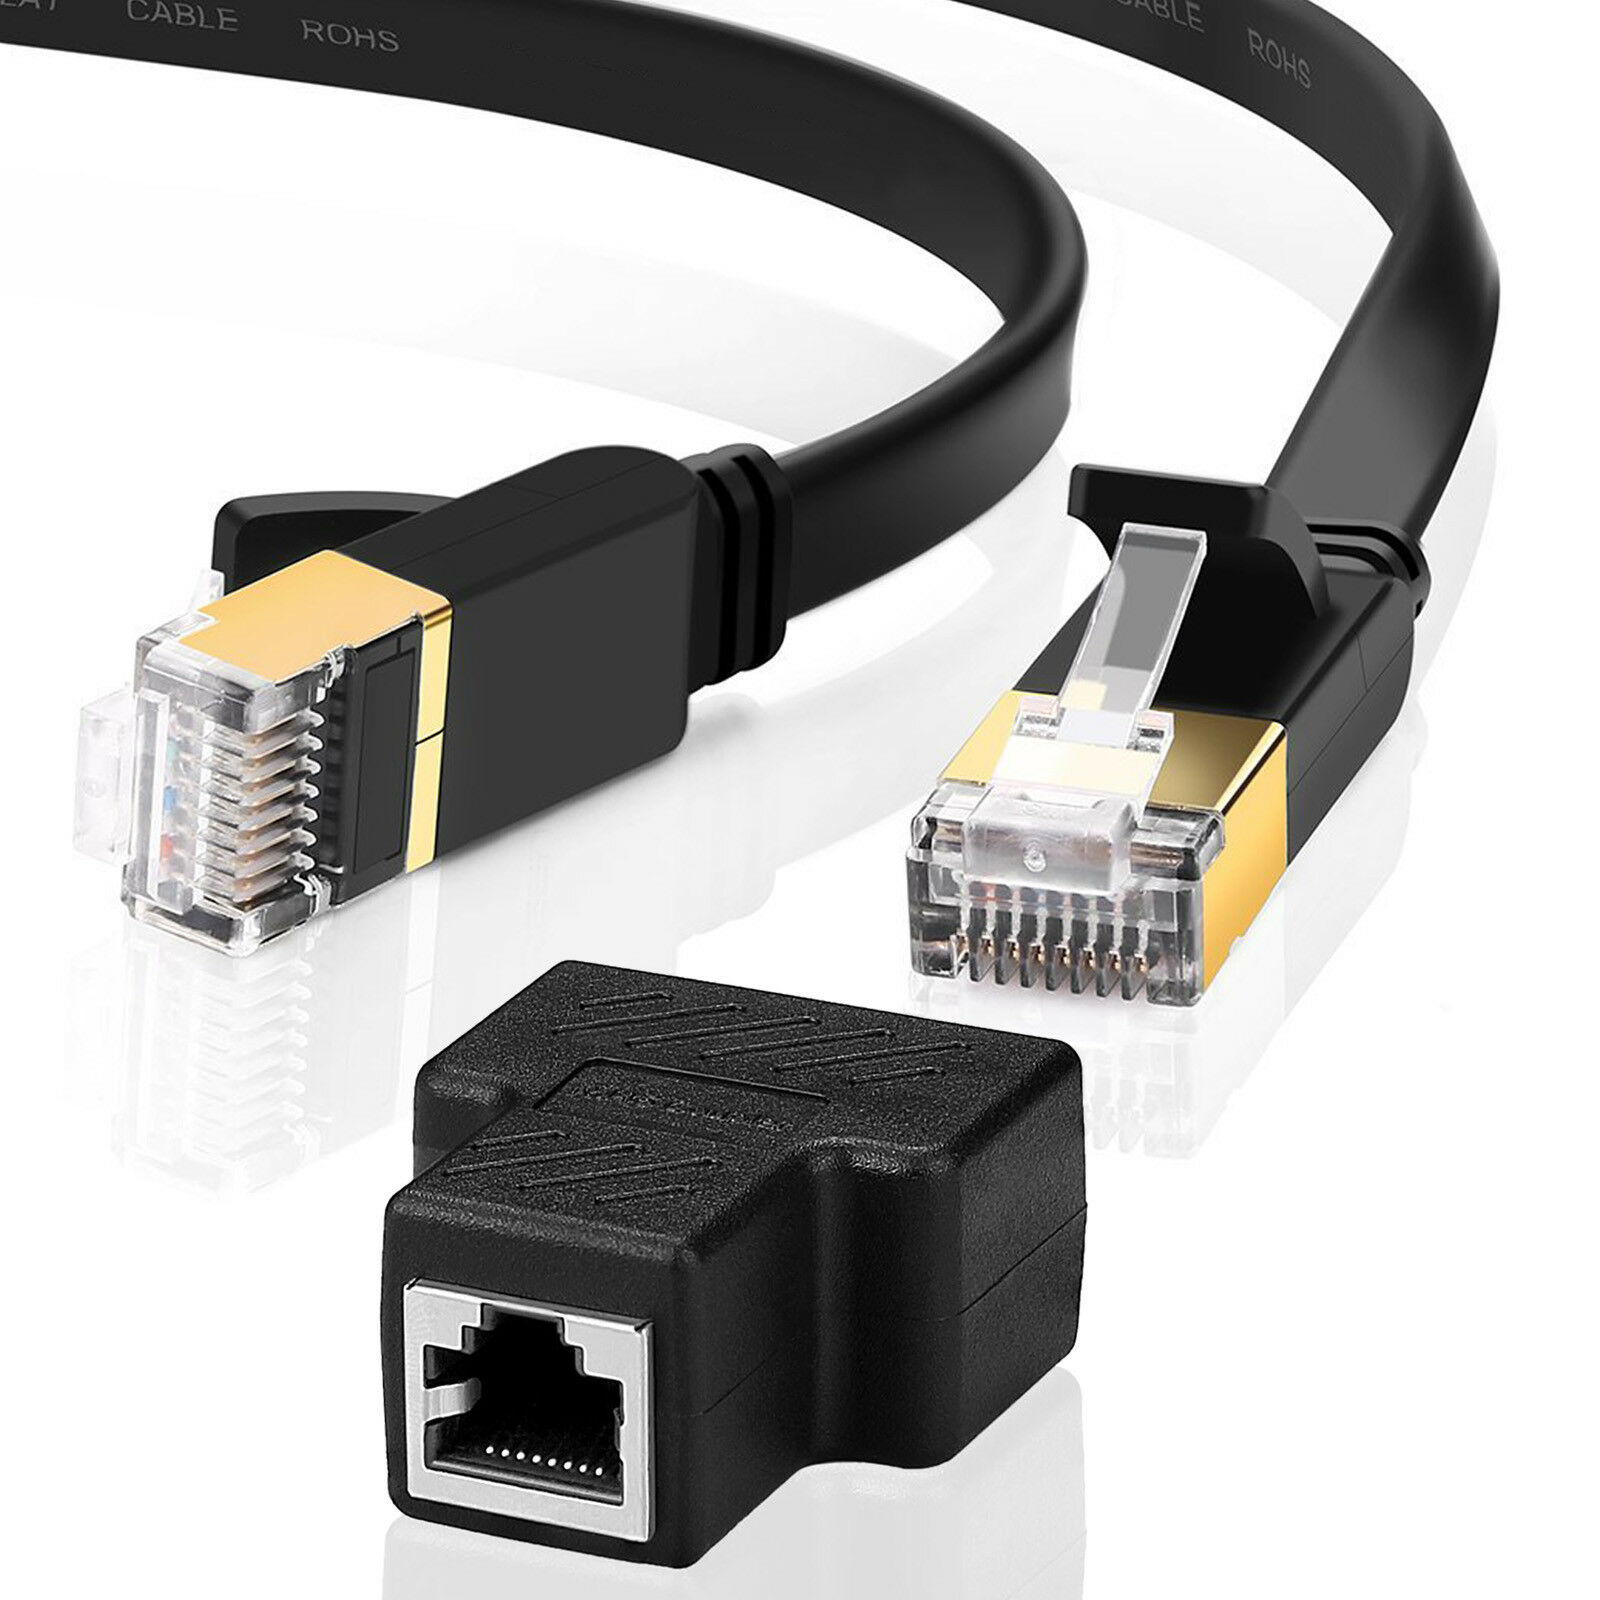 Networking Cables RJ-45, R MicroConnect 5M Cat5e RJ-45 to RJ-45 M//M